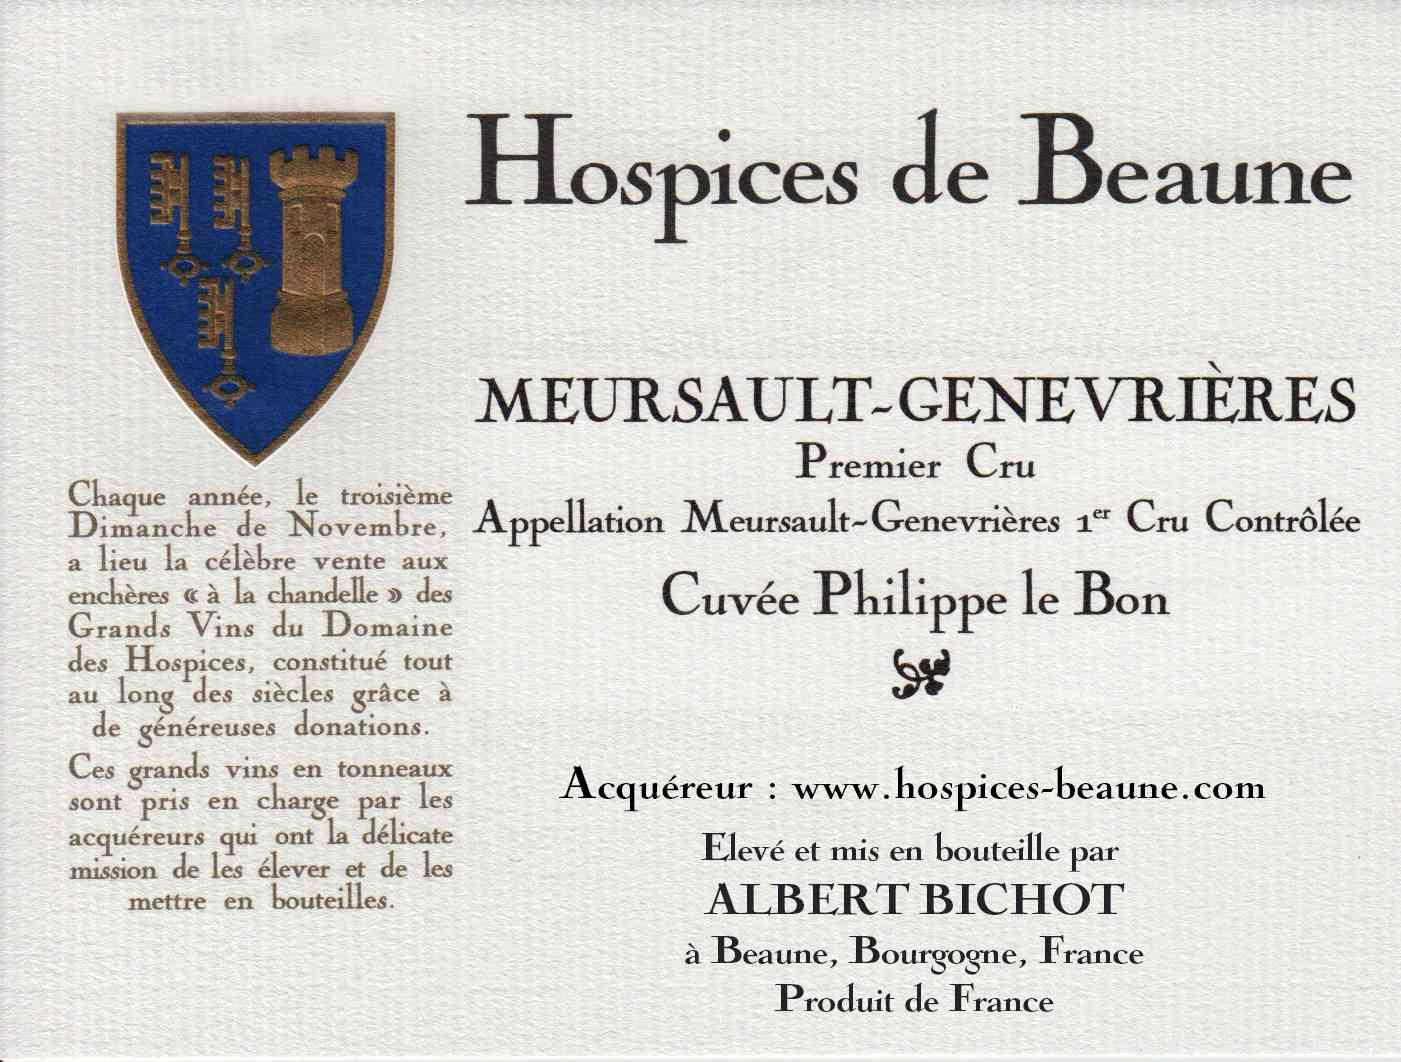 Encheres-auction-HospicesdeBeaune-AlbertBichot-Meursault-Genevrieres-PremierCru-Cuvee-PhilippeLeBon